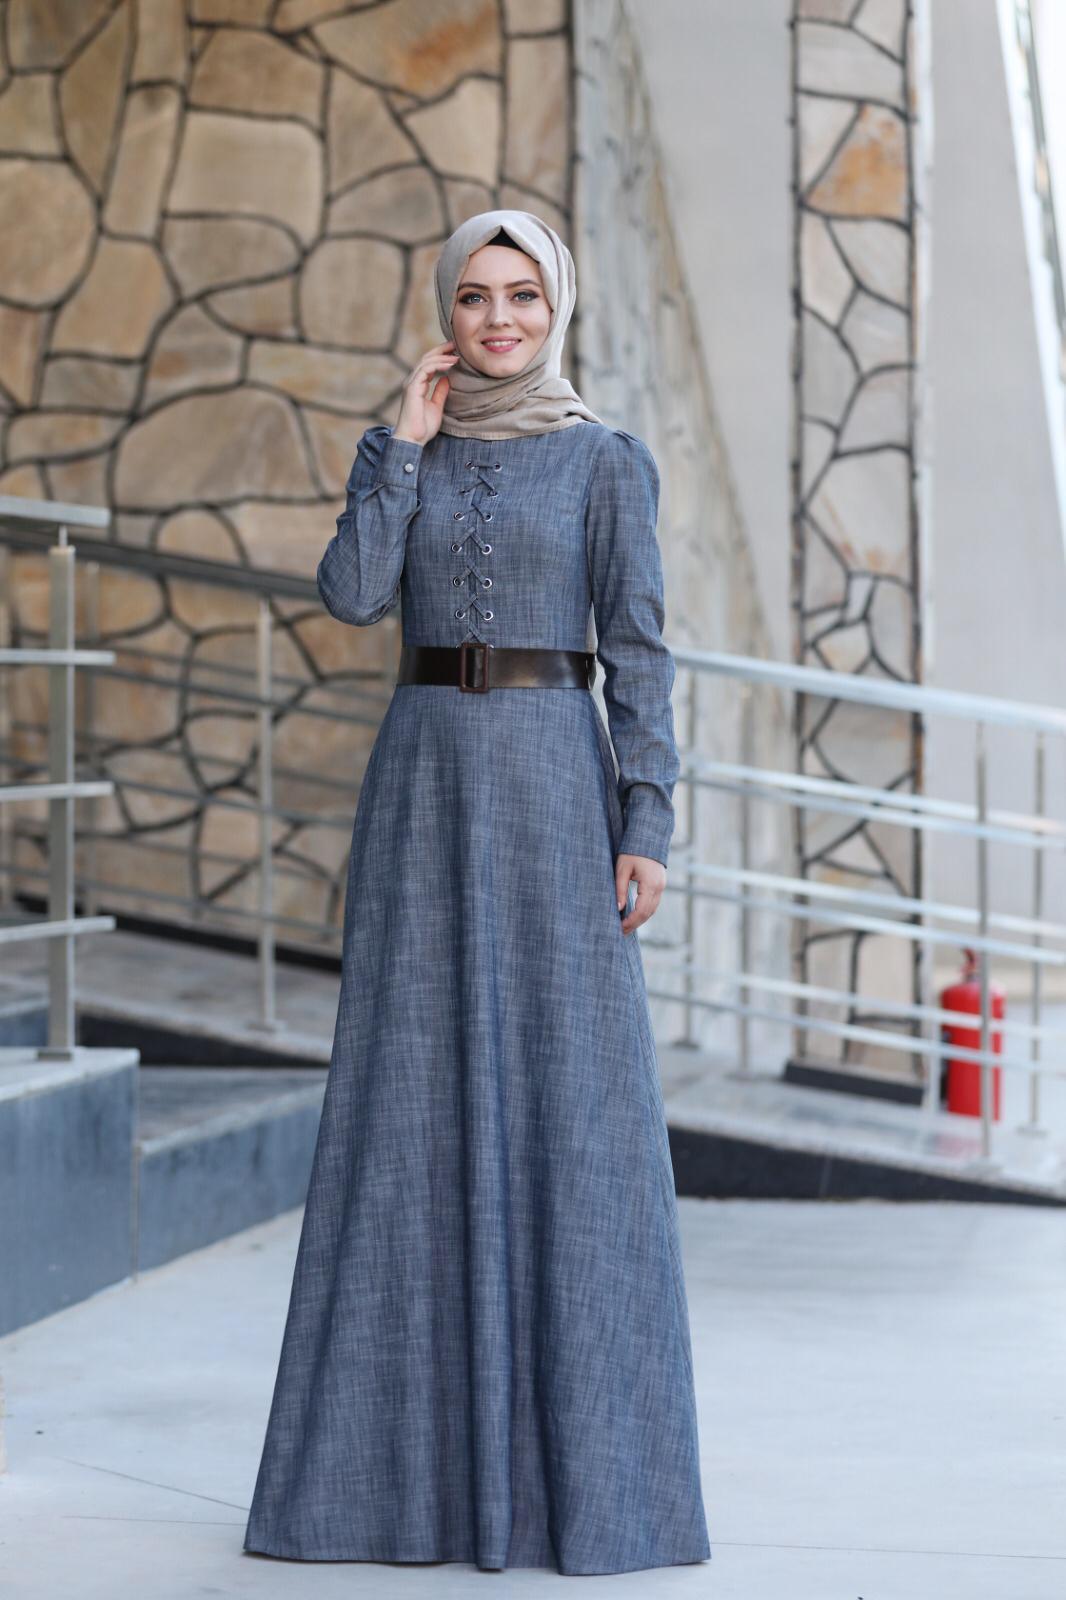 Tensel Kumaş Bağcıklı Elbise mdc9632